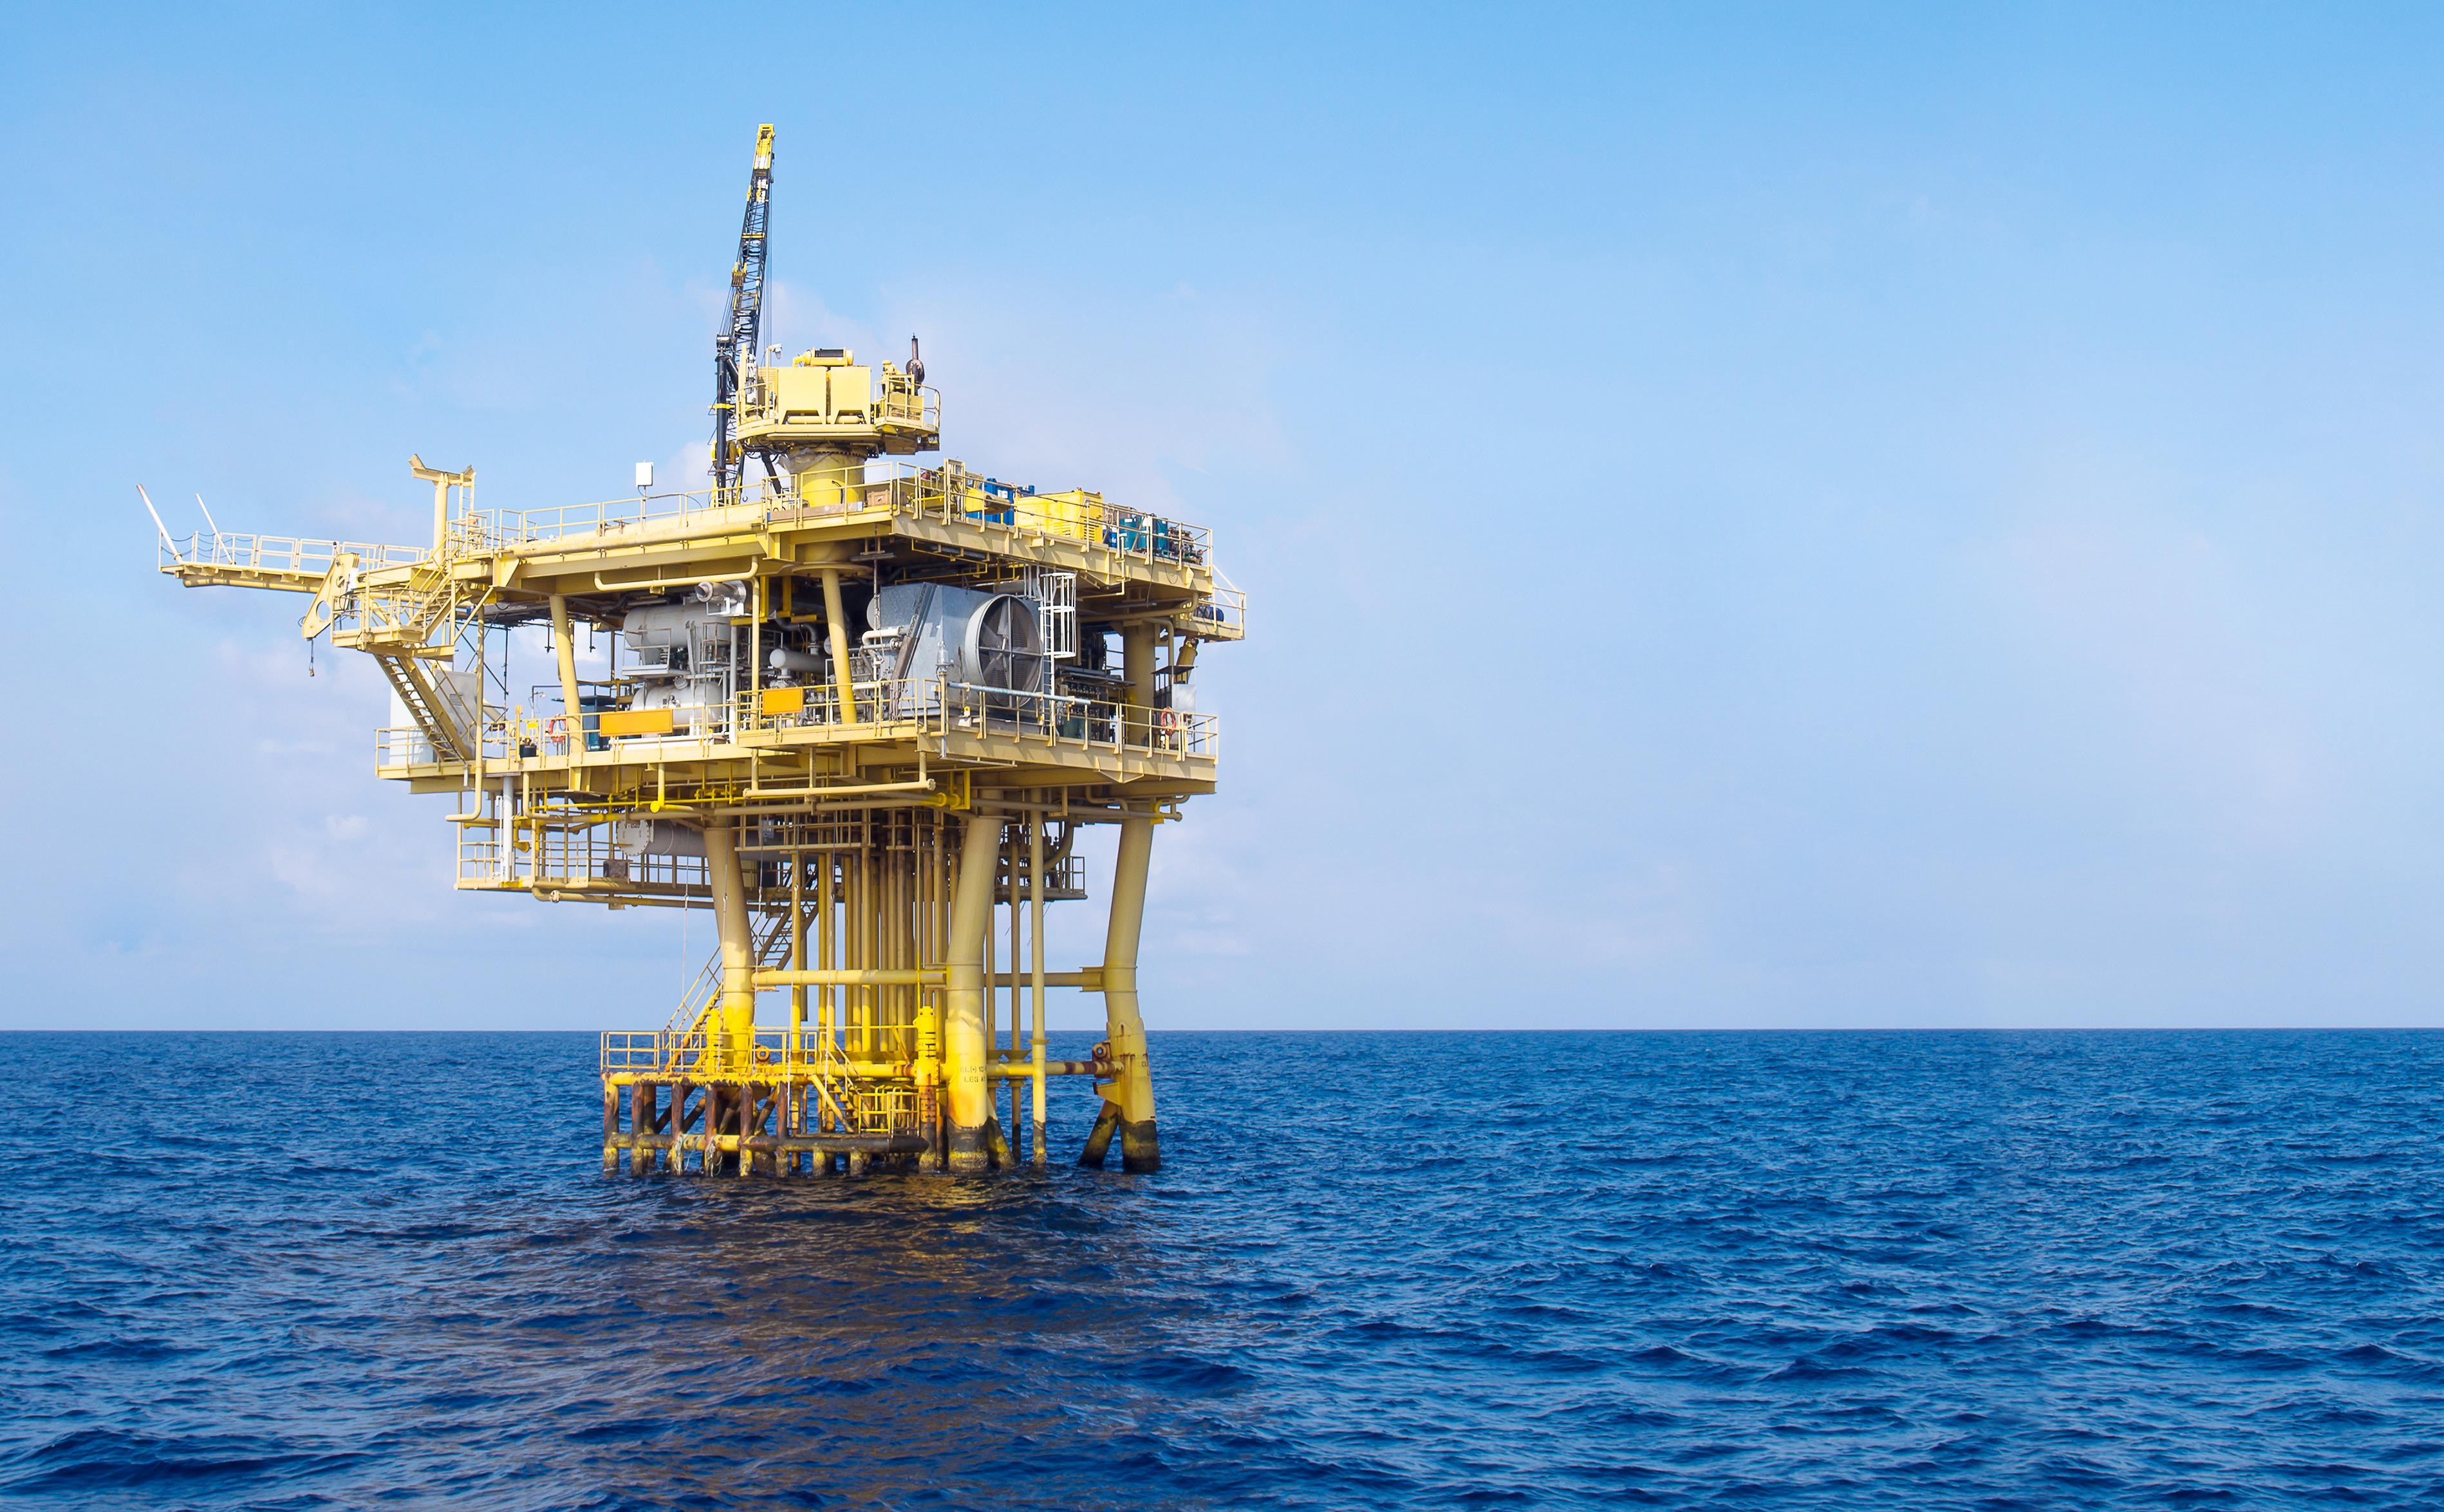 essay oil company southampton 91 121 113 106 essay oil company southampton prisma company